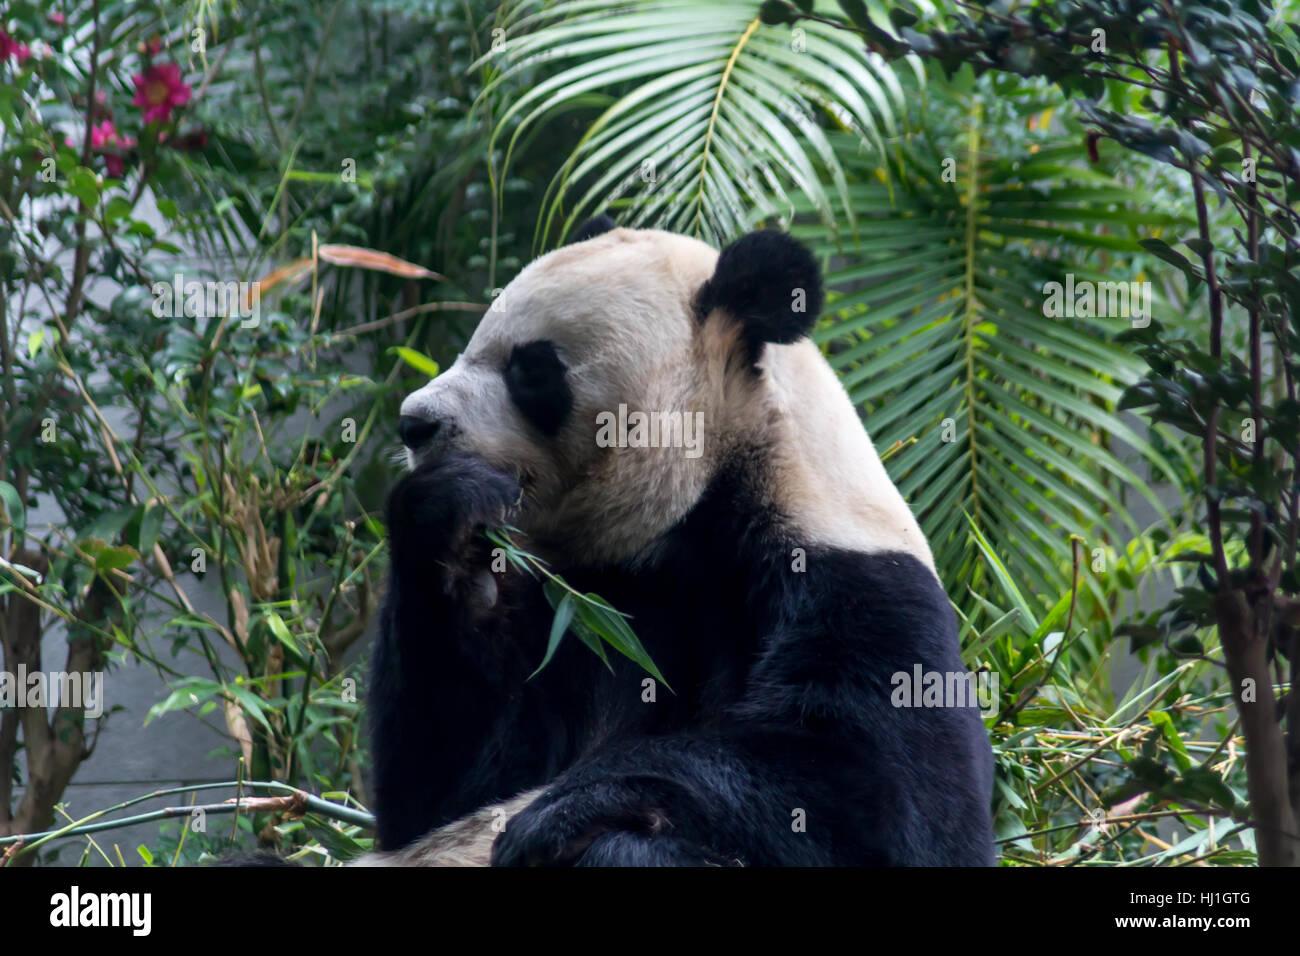 Cute Giant Panda eating bamboo from China - Stock Image